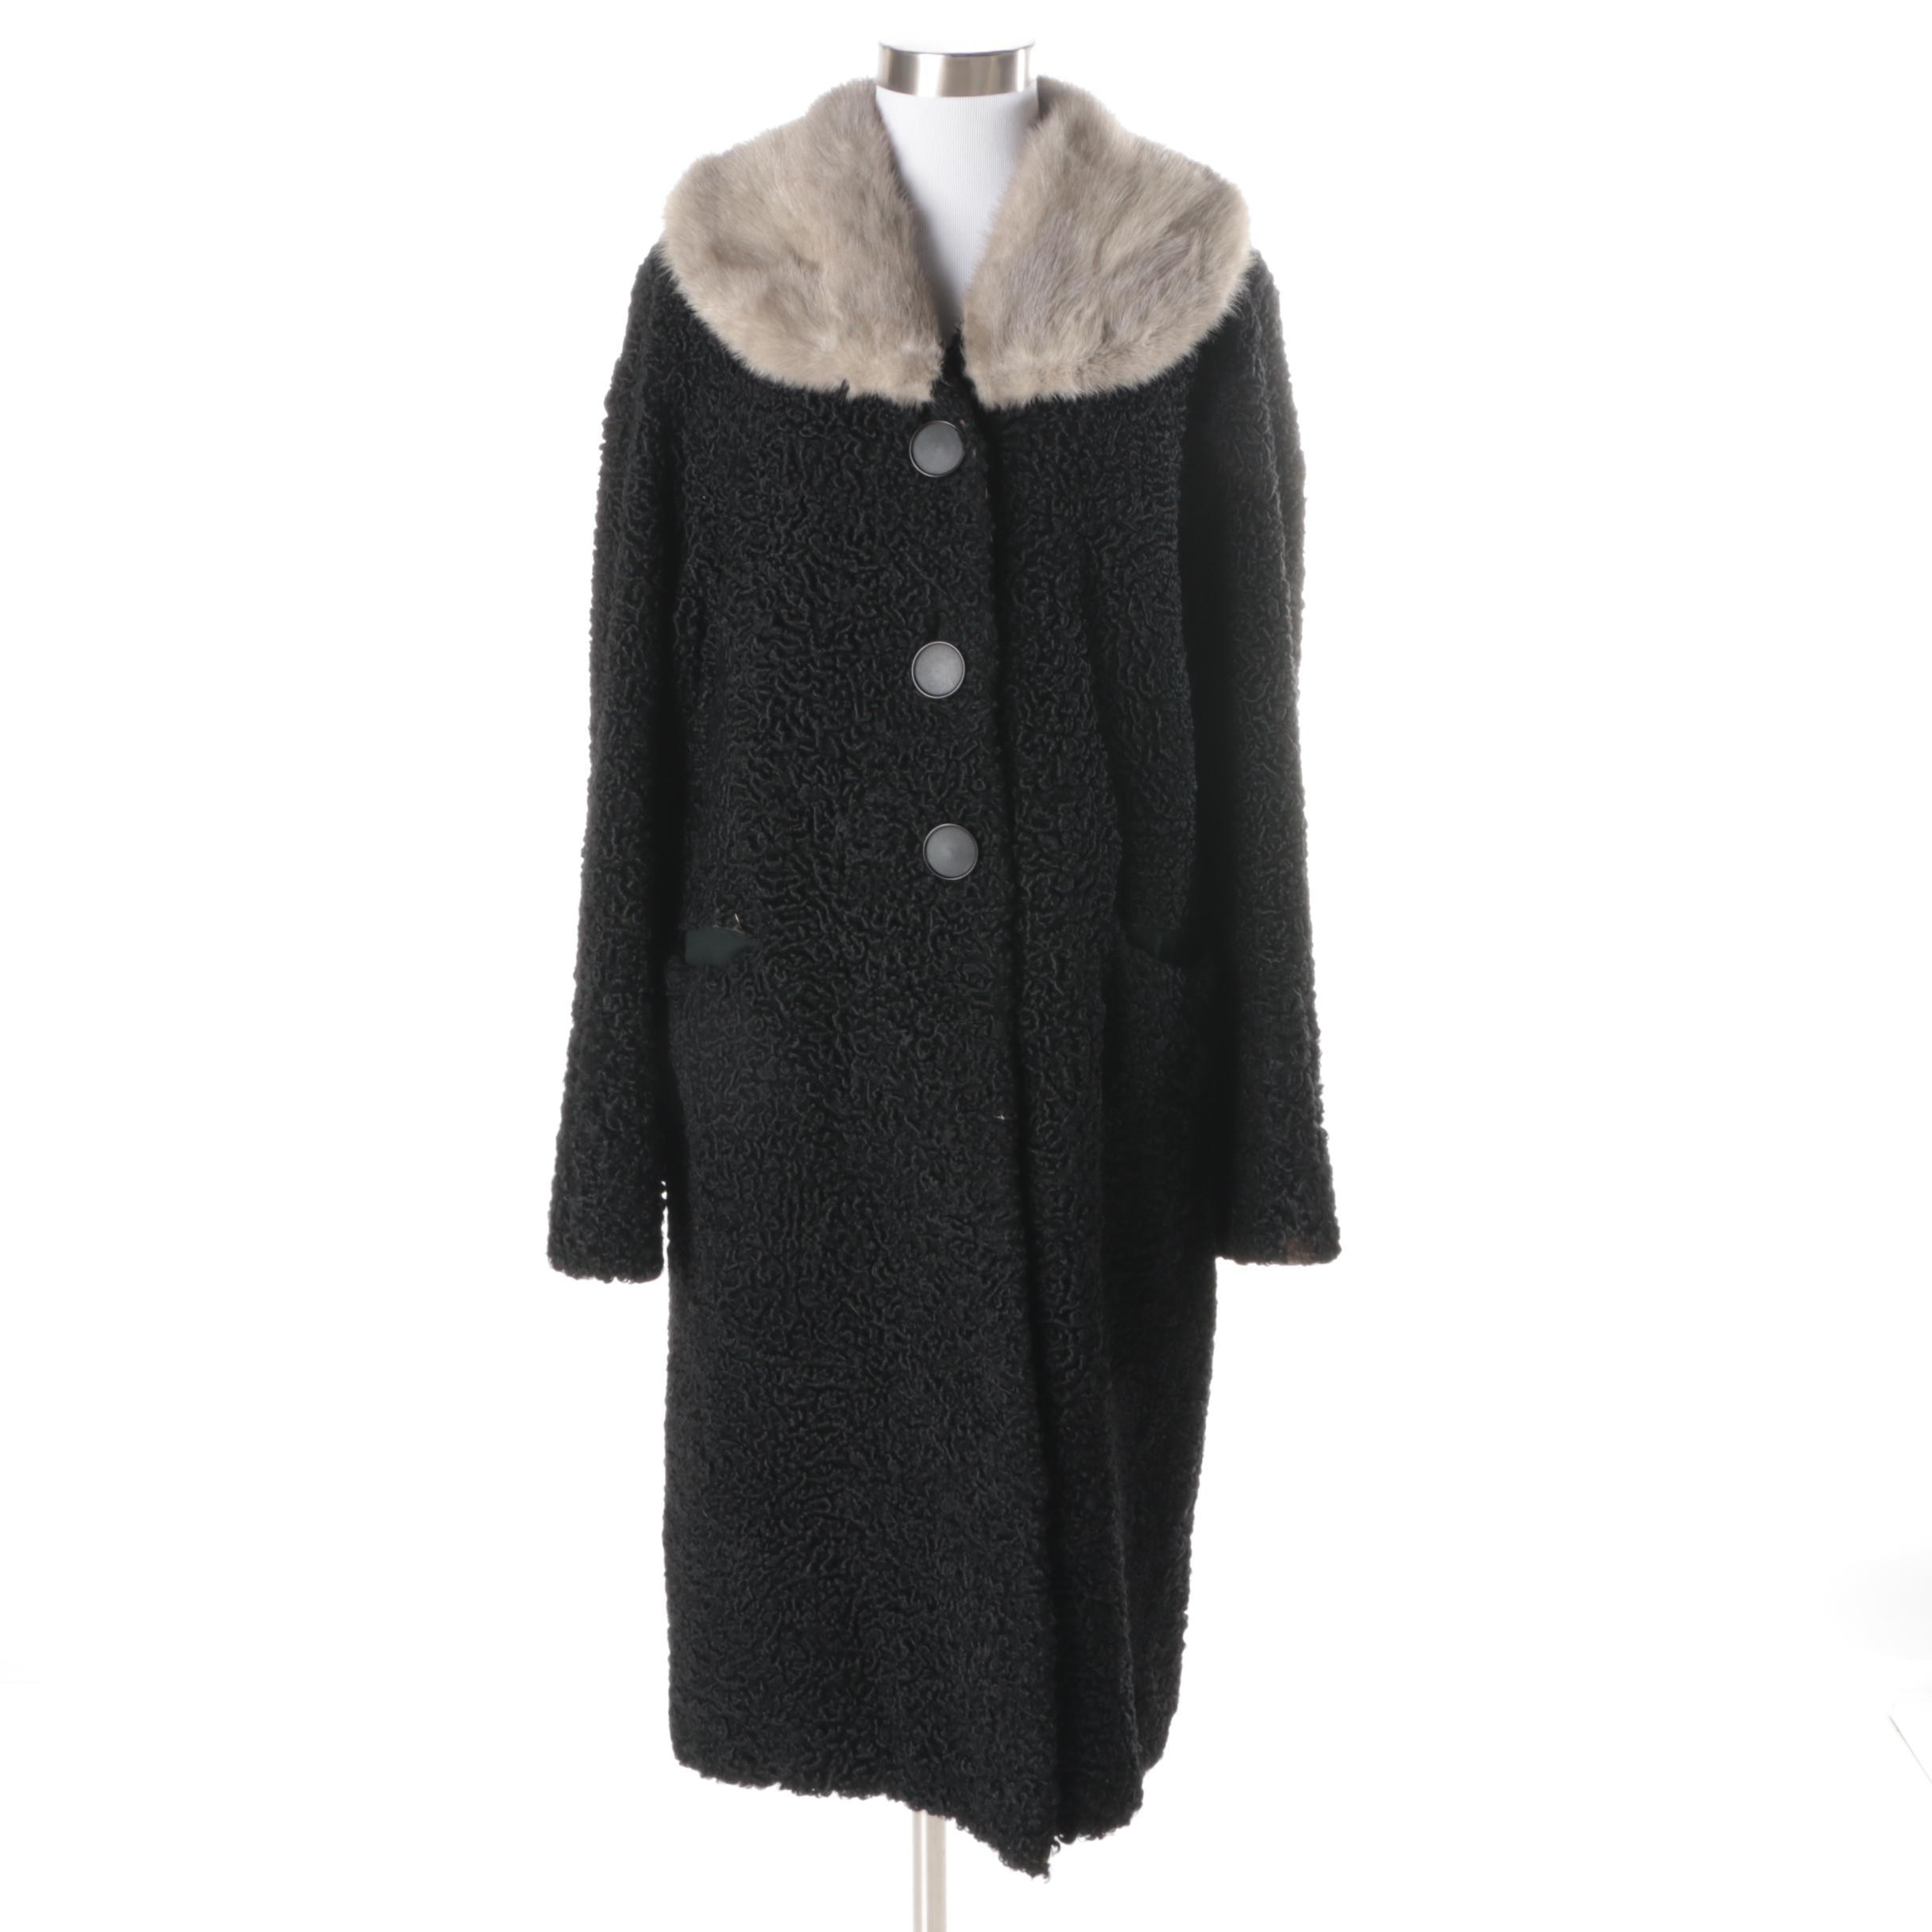 Women's Vintage Black Persian Lamb Coat with Mink Collar